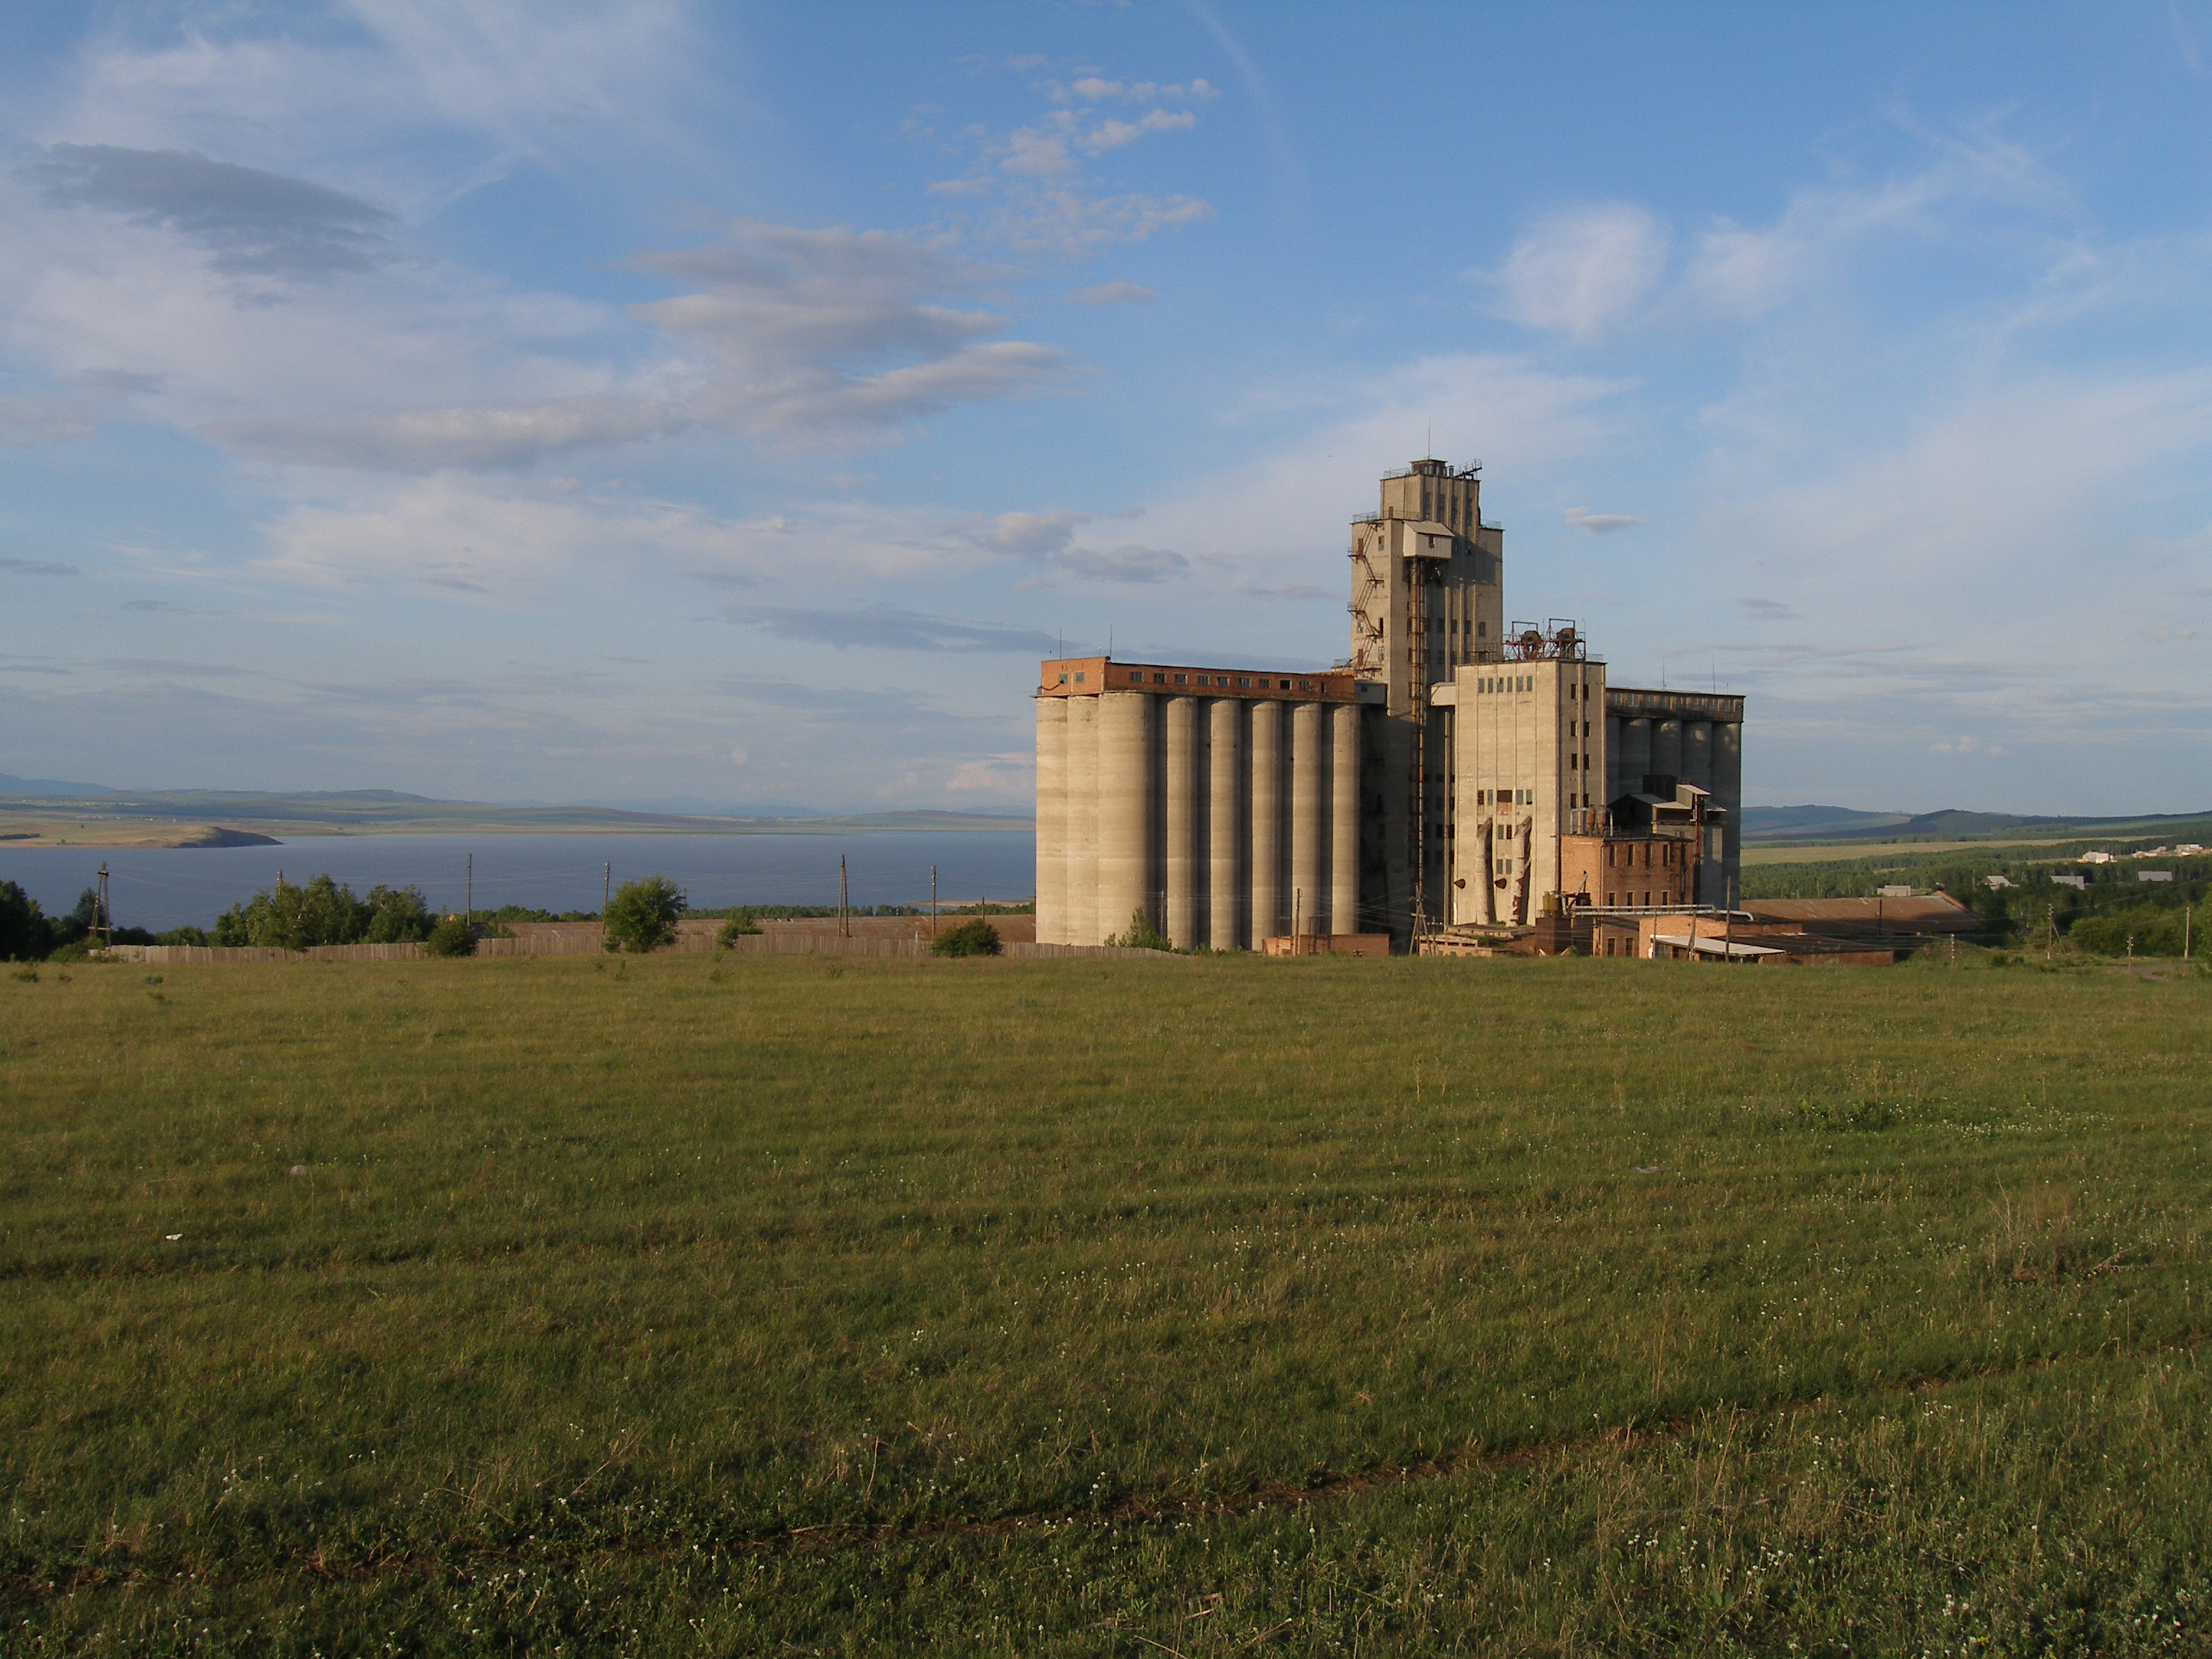 элеваторы склады зерносушилки юдаева